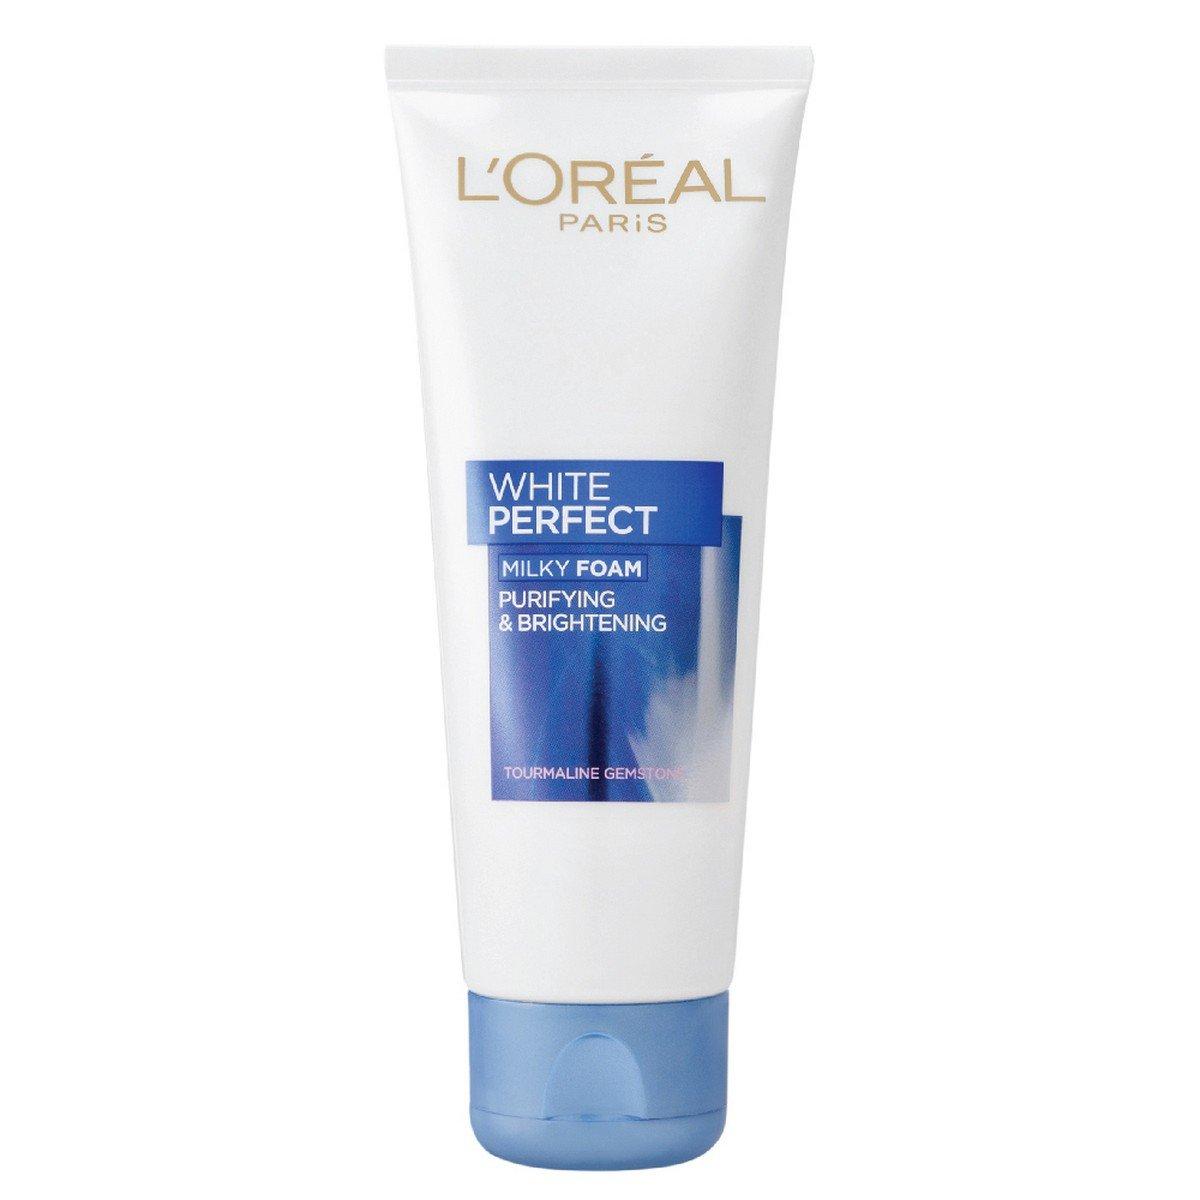 L'Oreal Paris White Perfect Milky Foam Facewash Image